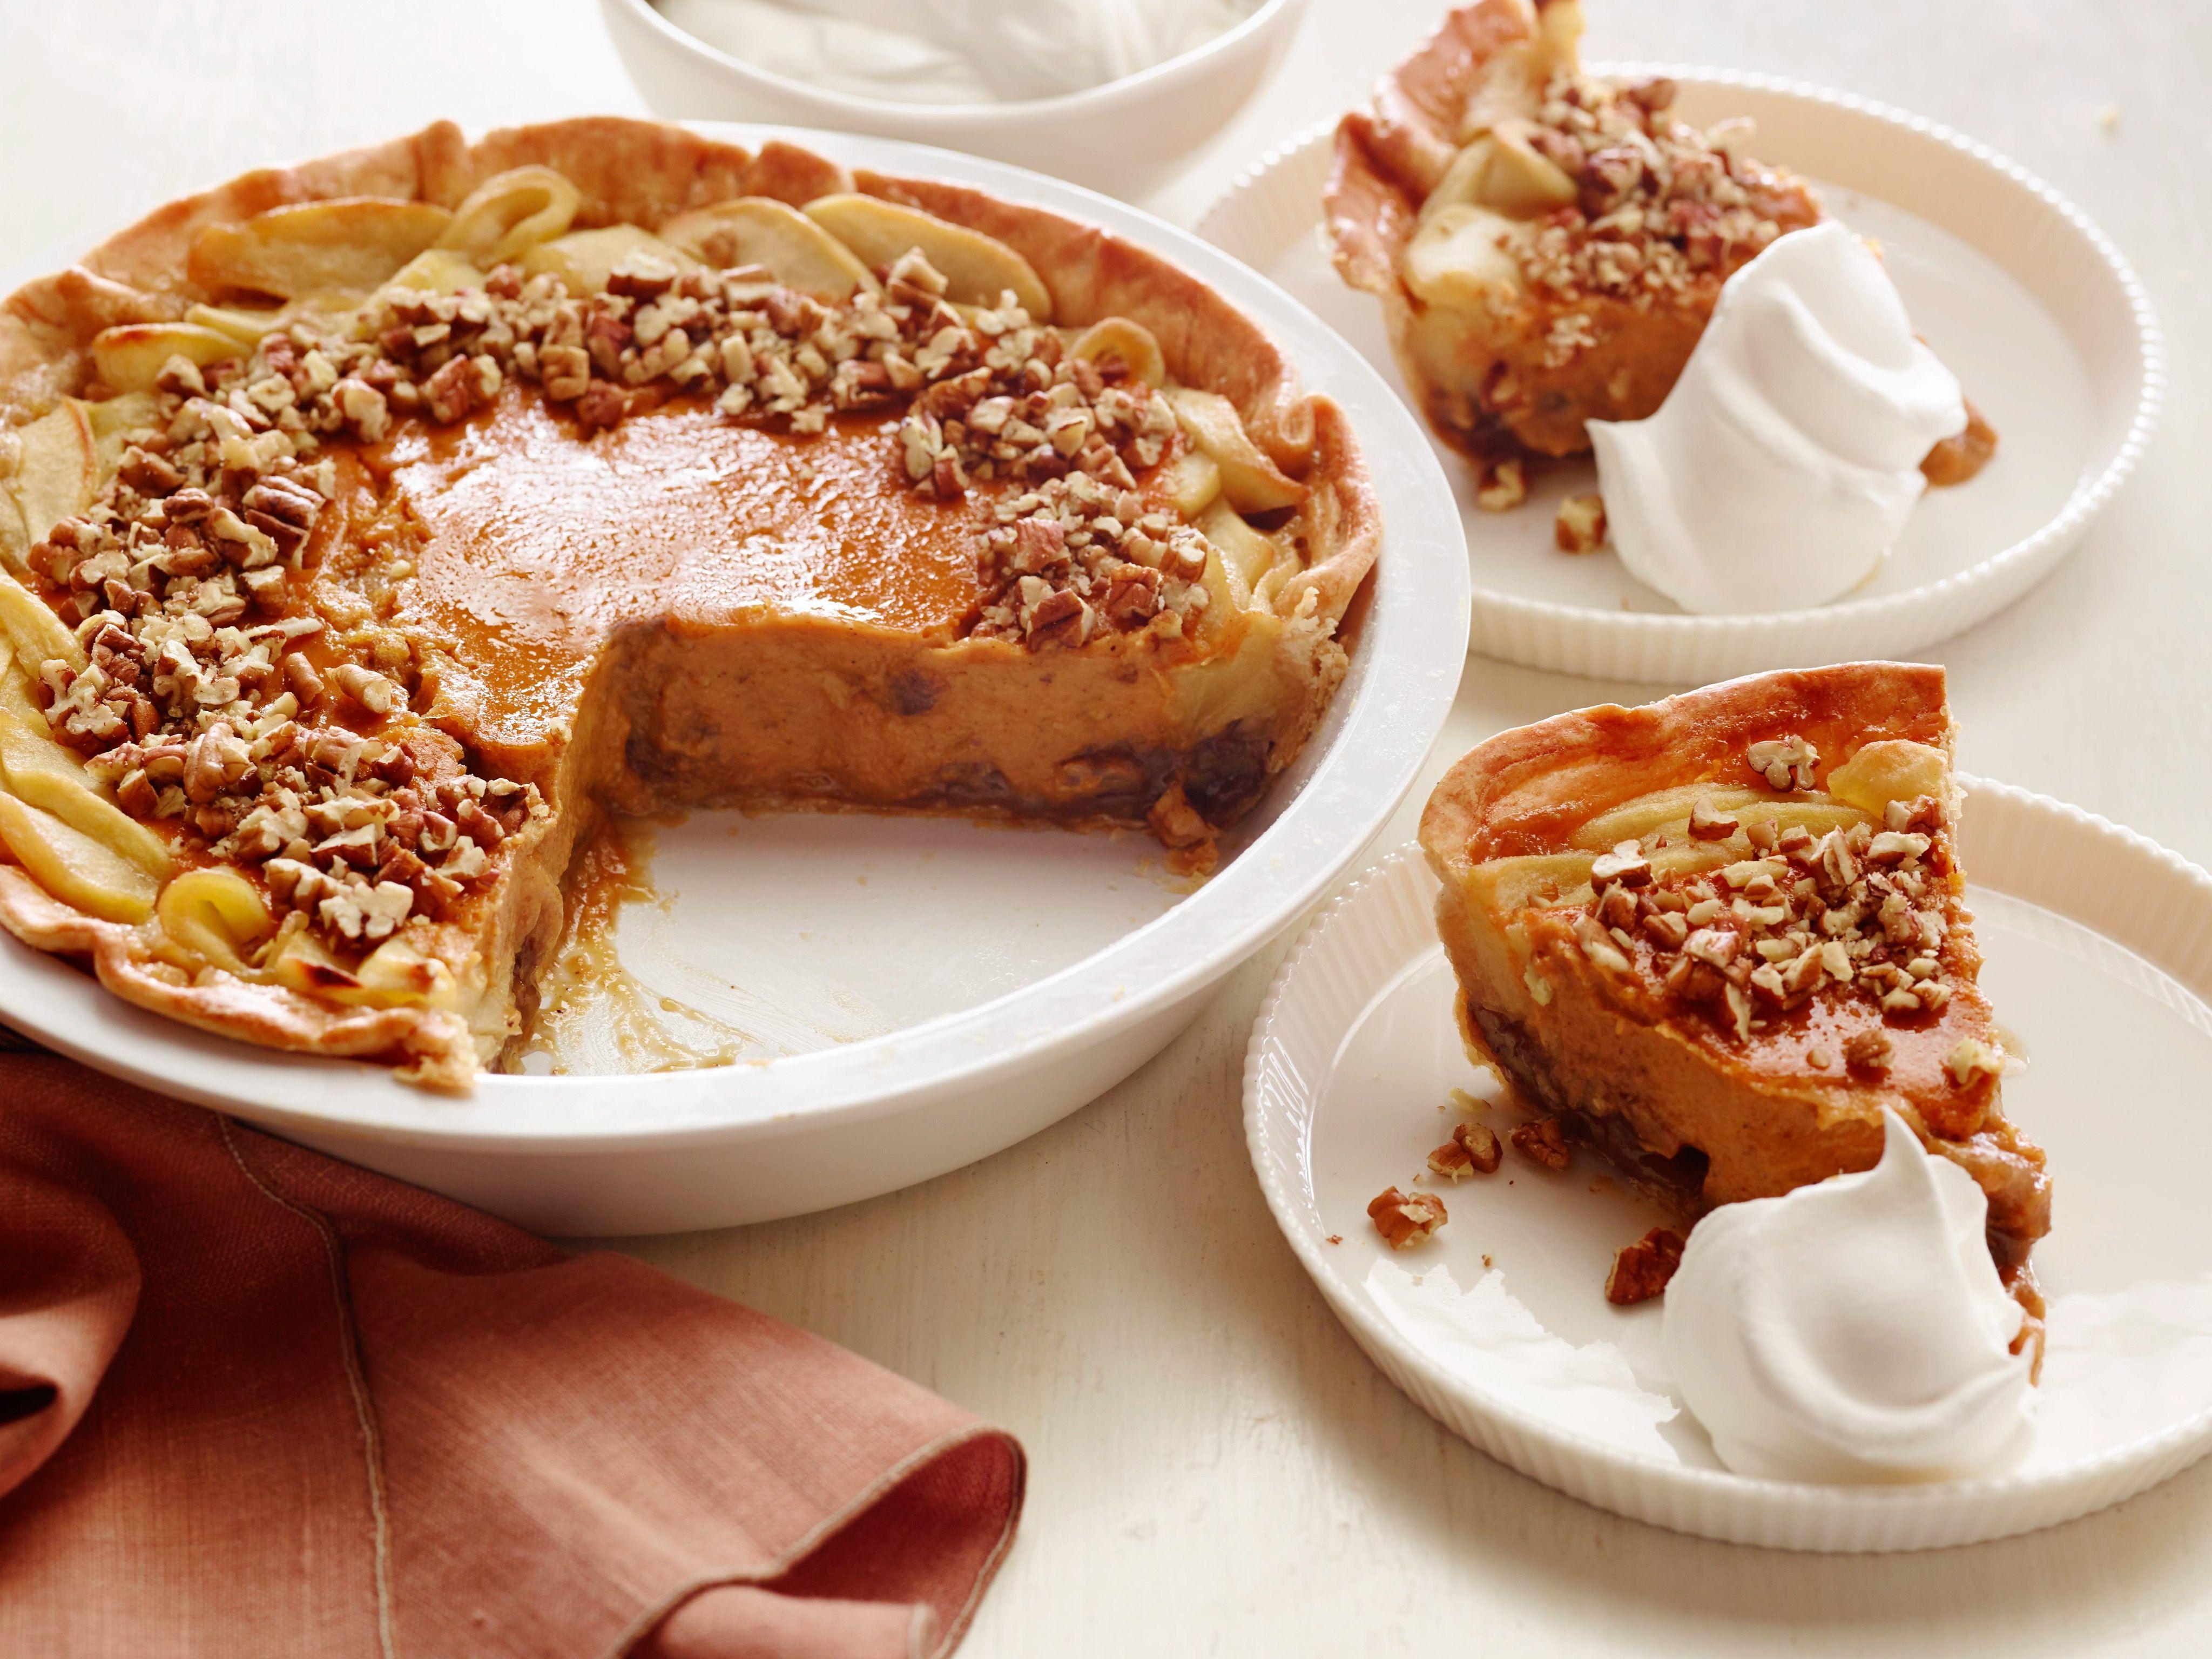 Ina Garten Pumpkin Pie get the best-ever dessert recipes and tips from your favorite